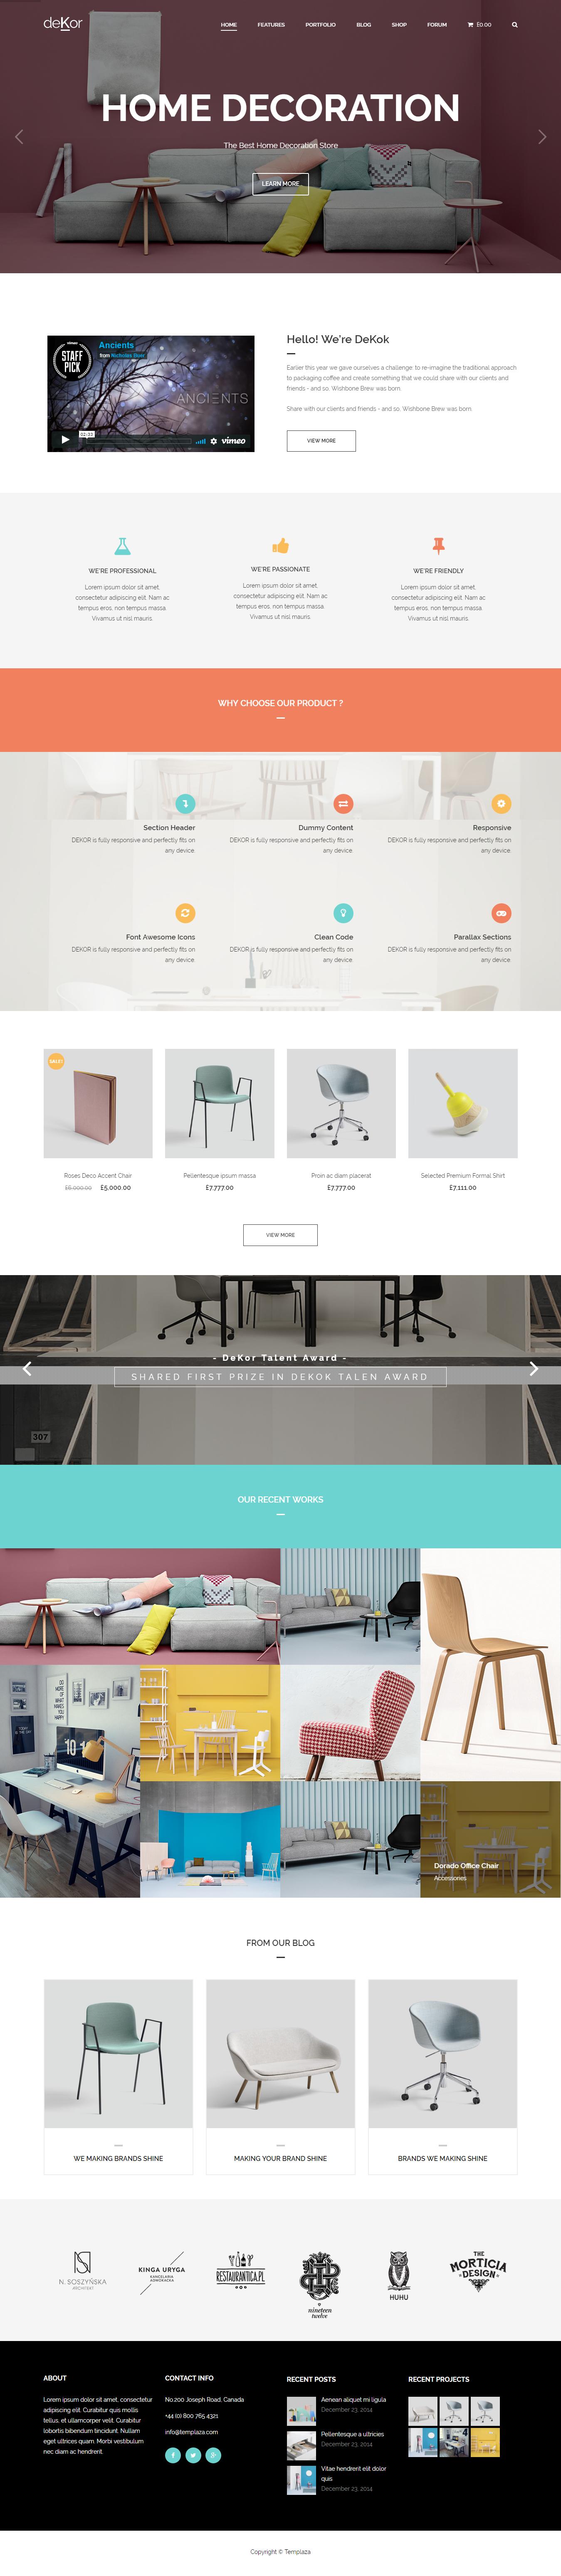 deKor best premium interior design wordpress theme - 10+ Best Premium Interior Design WordPress Themes